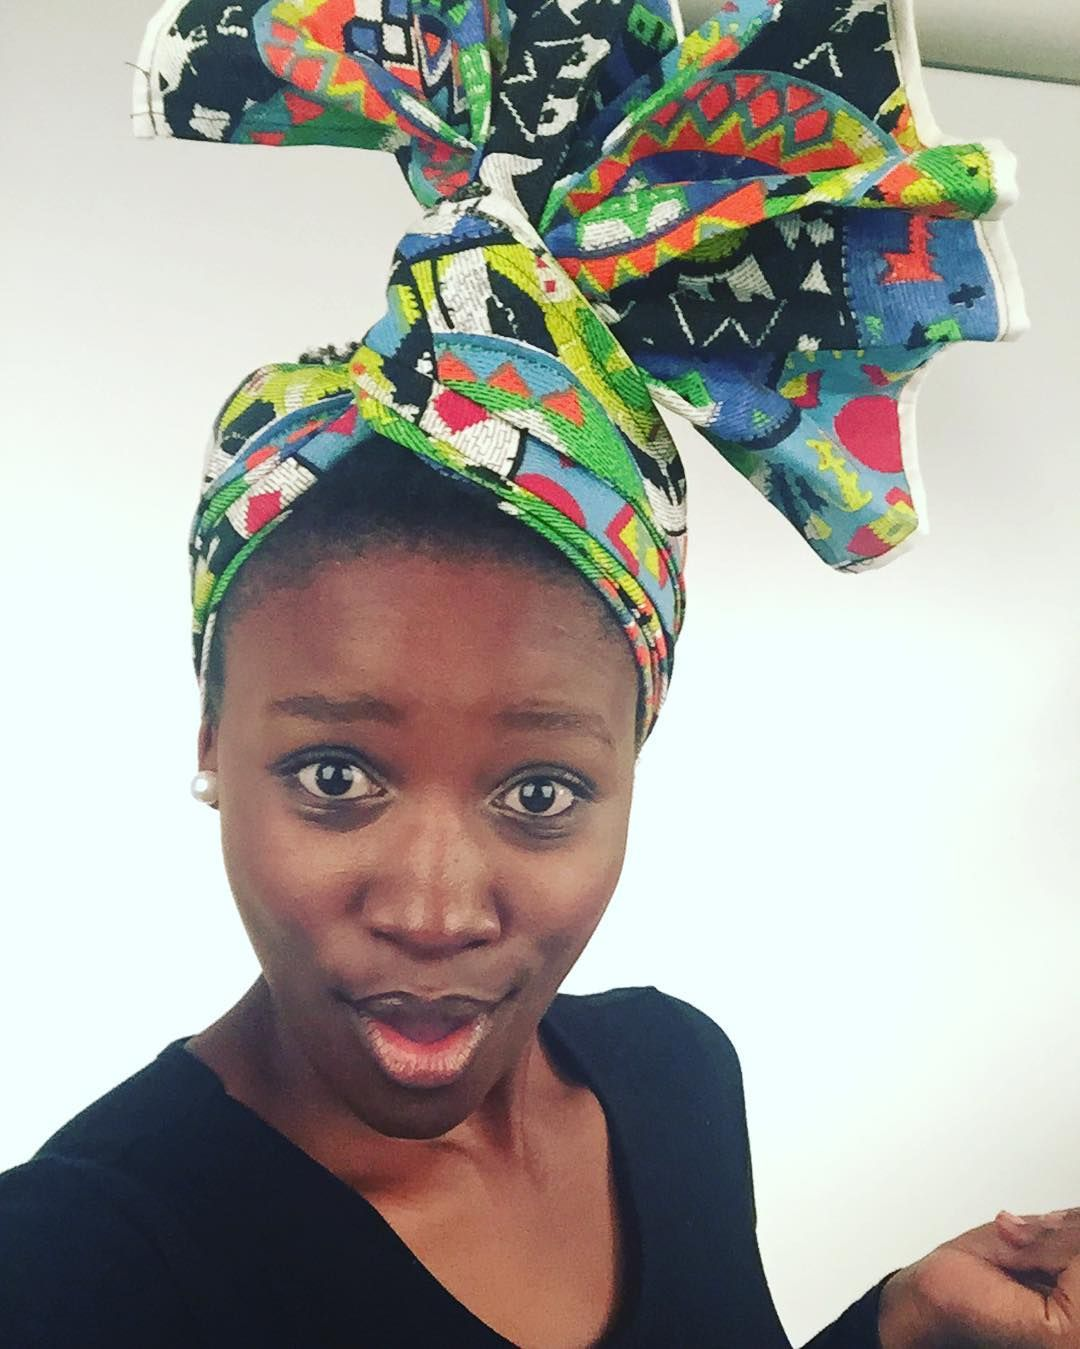 Oh you like my Head Wrap? Well order your e-book now at the Pre-sale price of R60 before the launch   Www.taji.co.za  #headwrap #headscarf #doek #duku #tuku #nje #zithandebeyps #queenin #mrsceo #atitagain #Princessofee